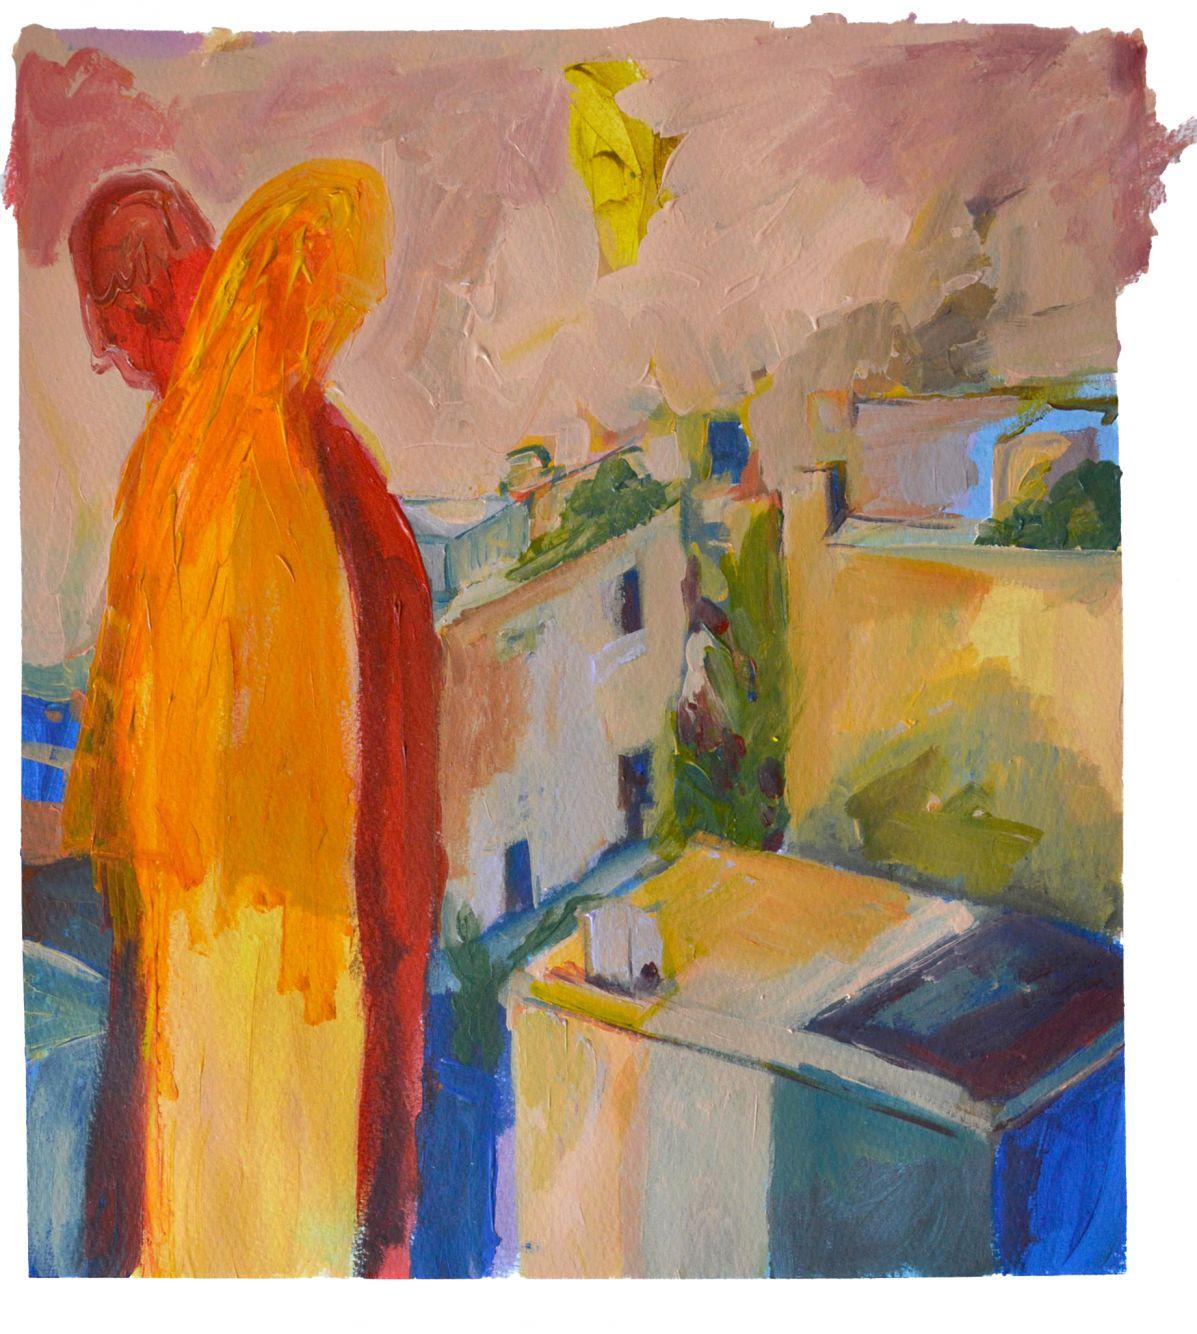 Ciudades fantasama (2020) - Elisa Pinto